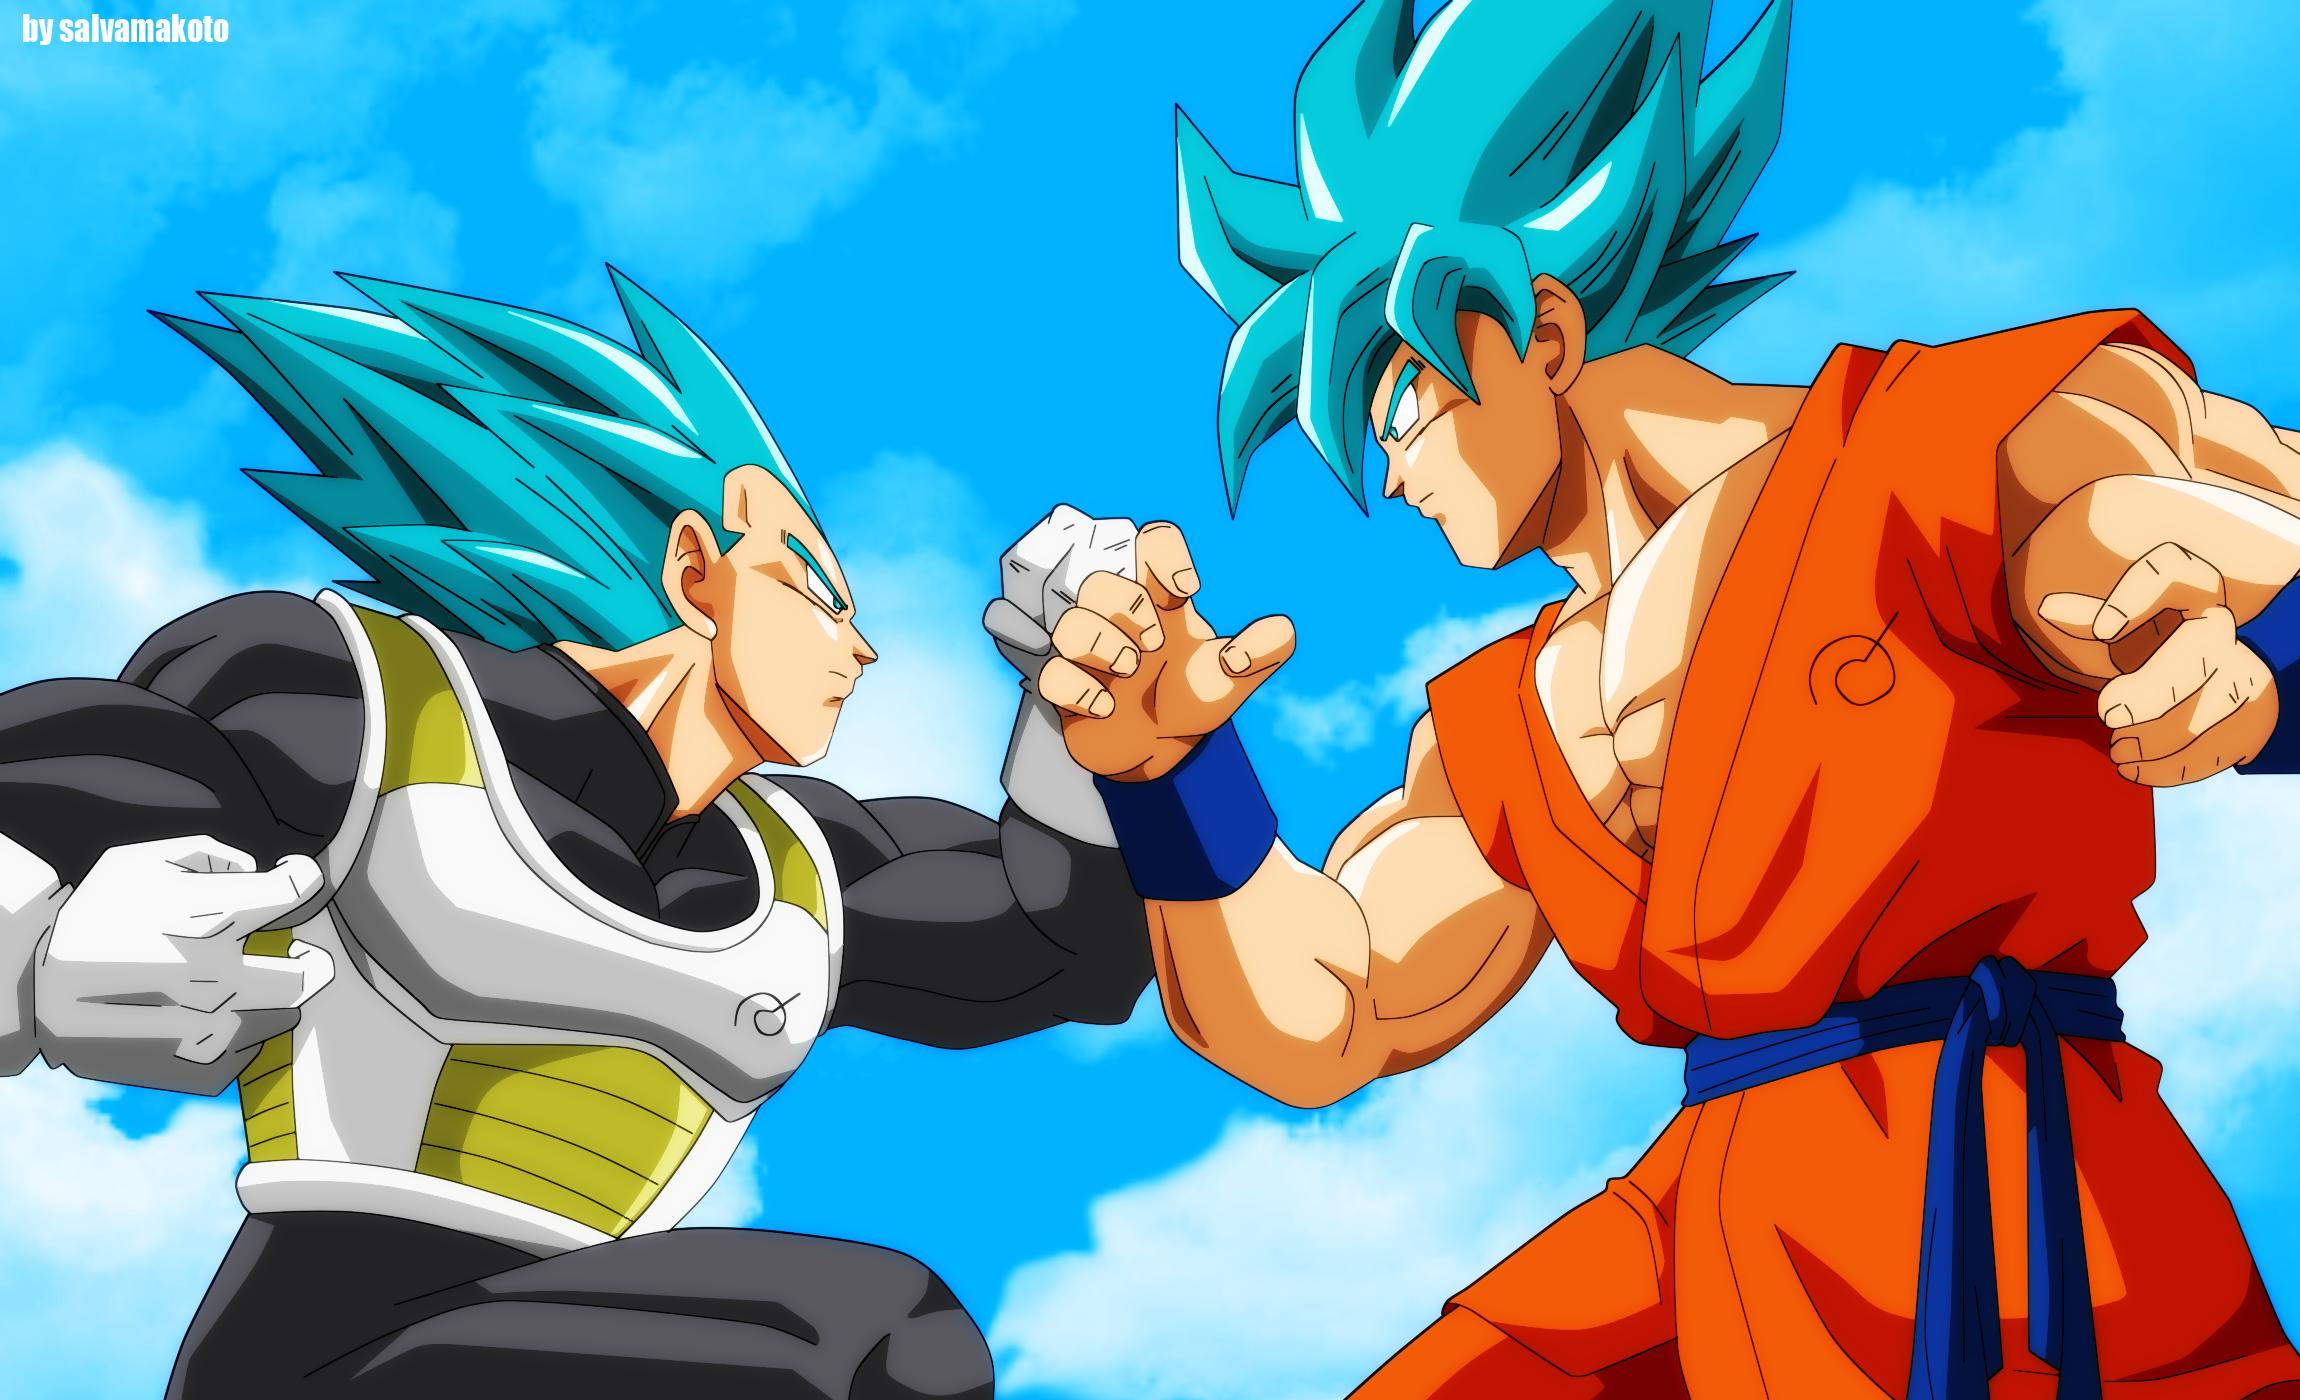 Vegeta Y Goku 2015 by salvamakoto on DeviantArt